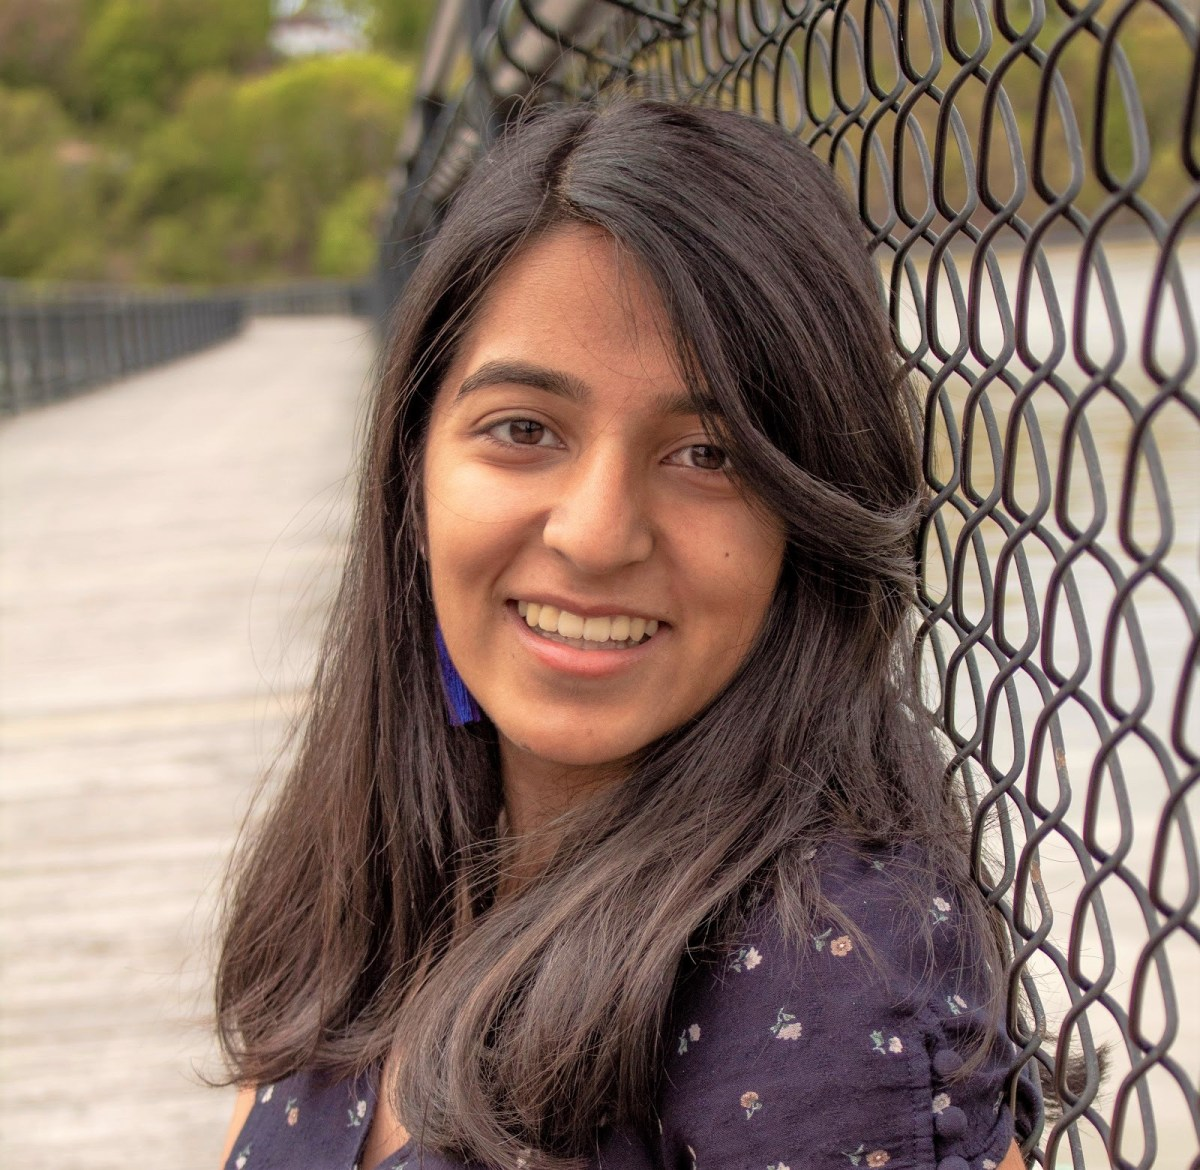 Ankita Morari